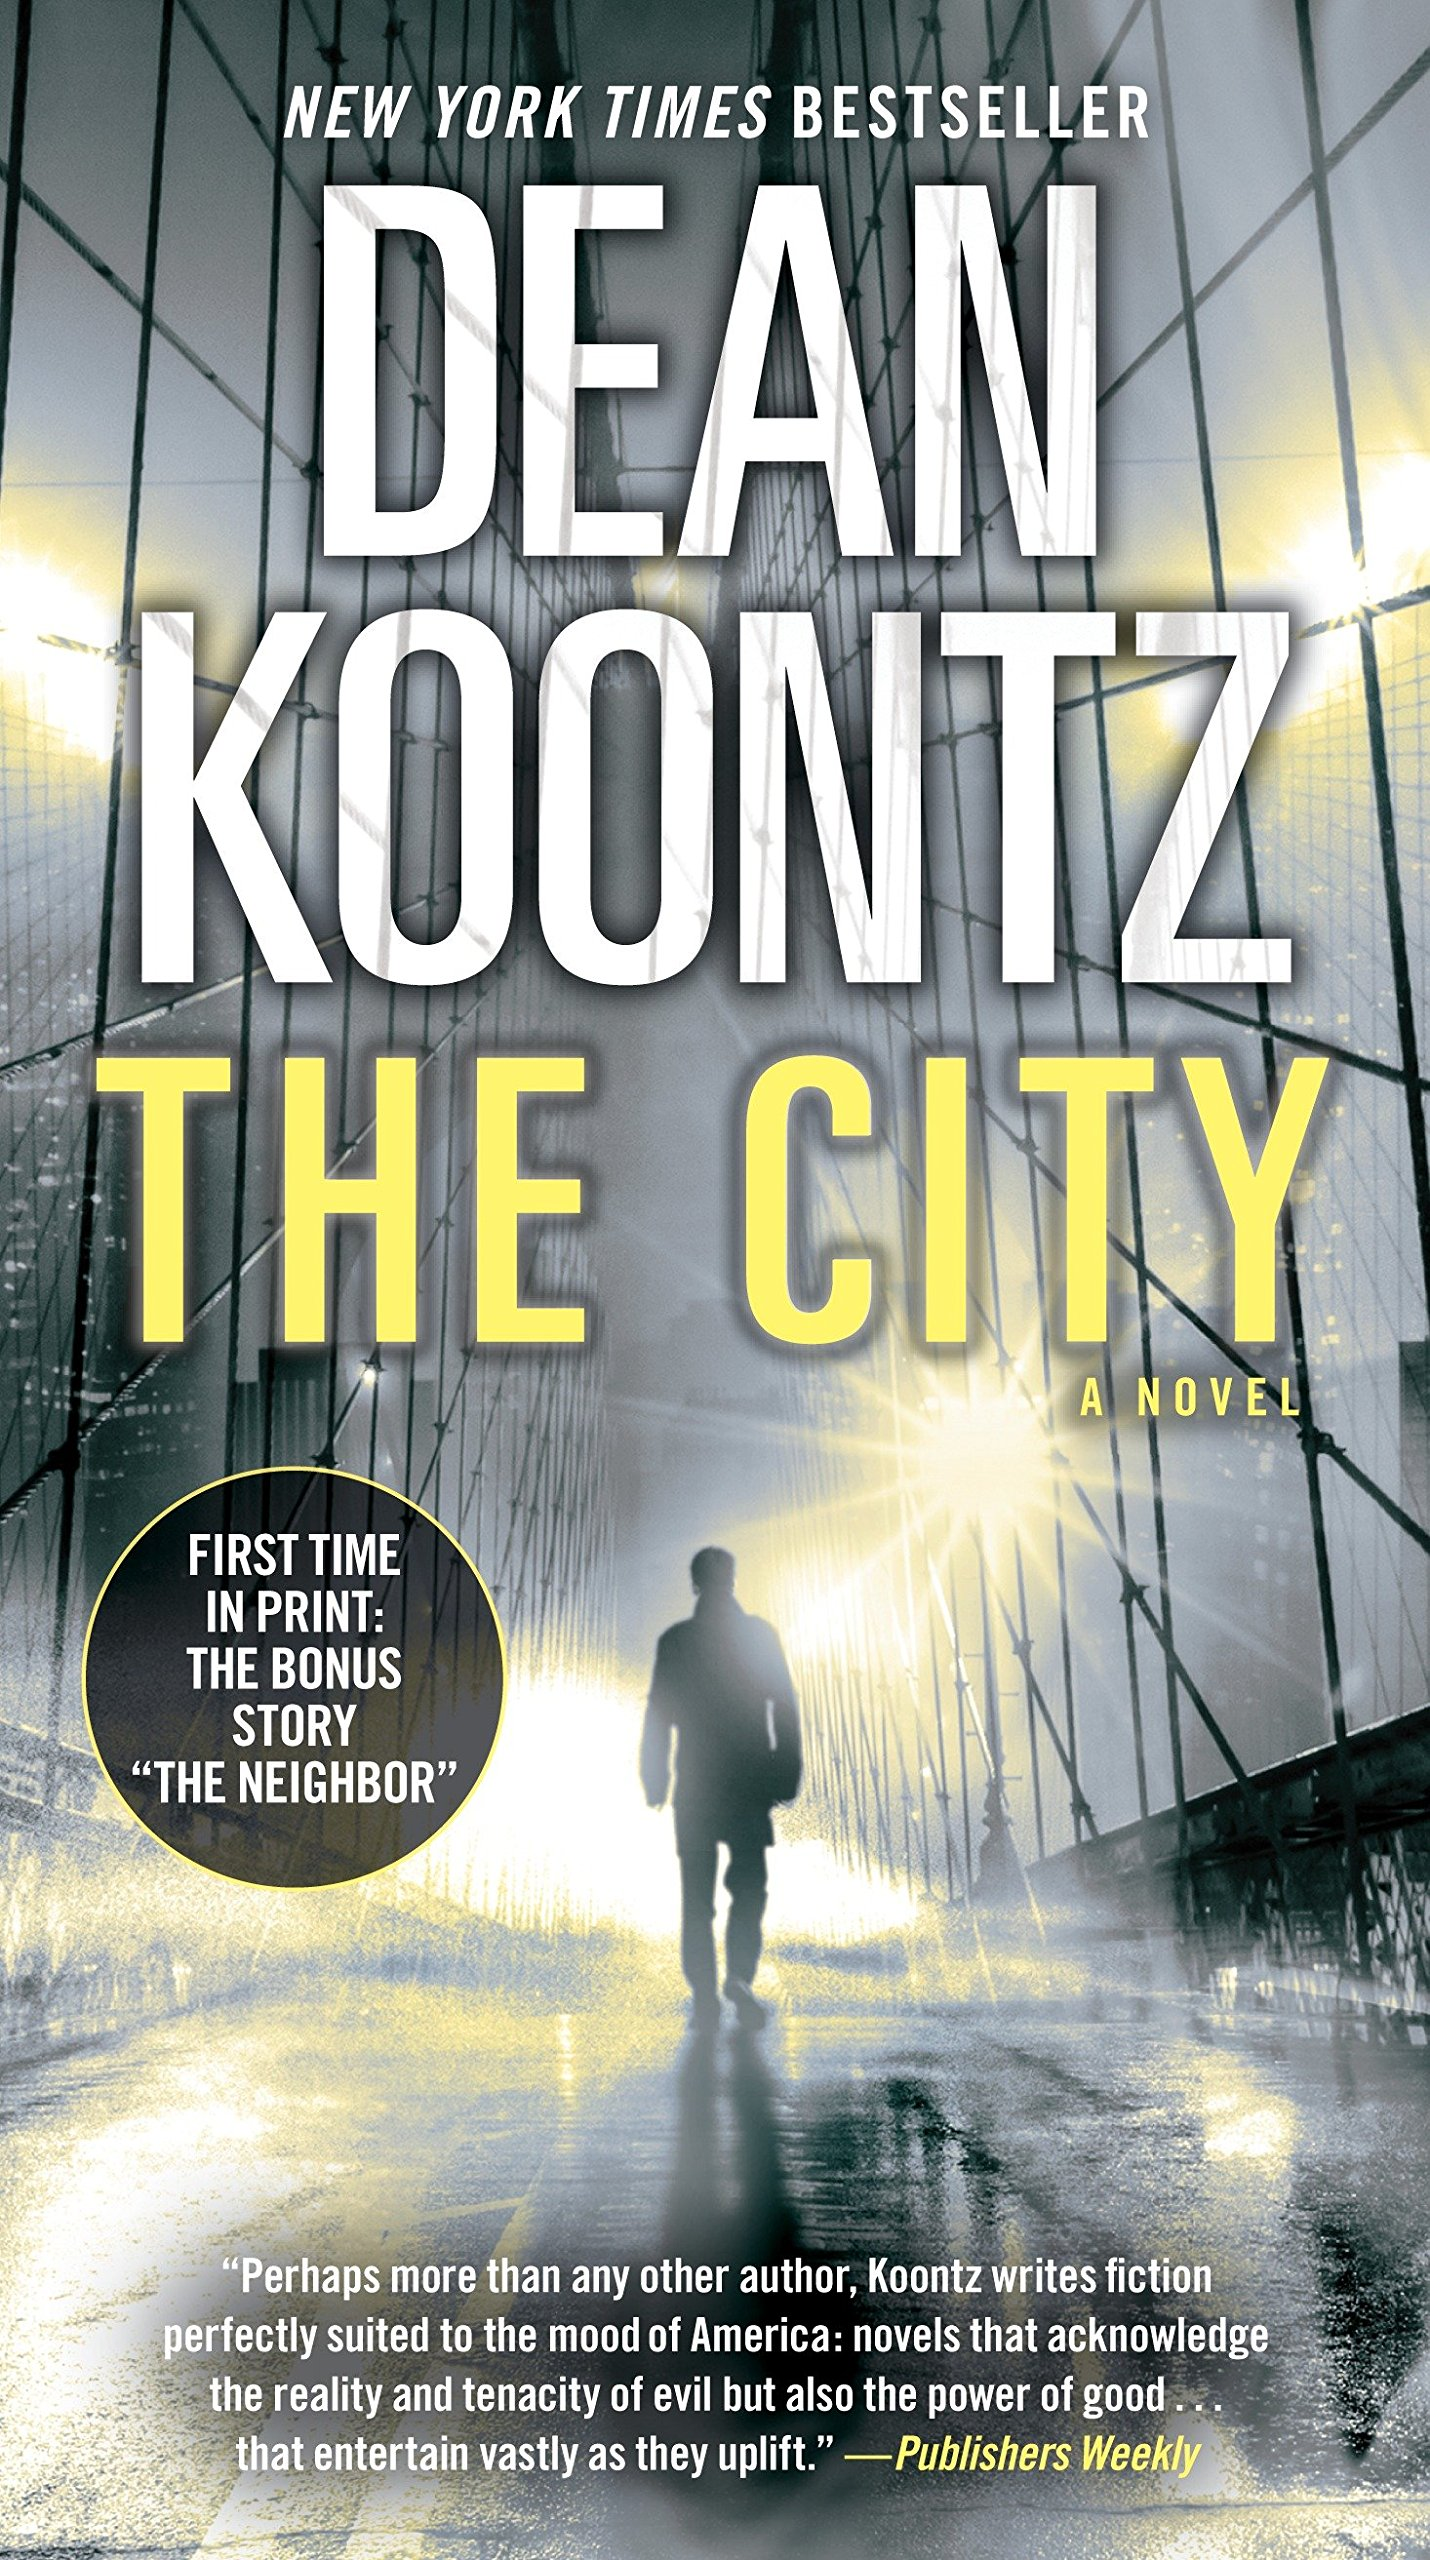 Read Online The City (with bonus short story The Neighbor): A Novel PDF